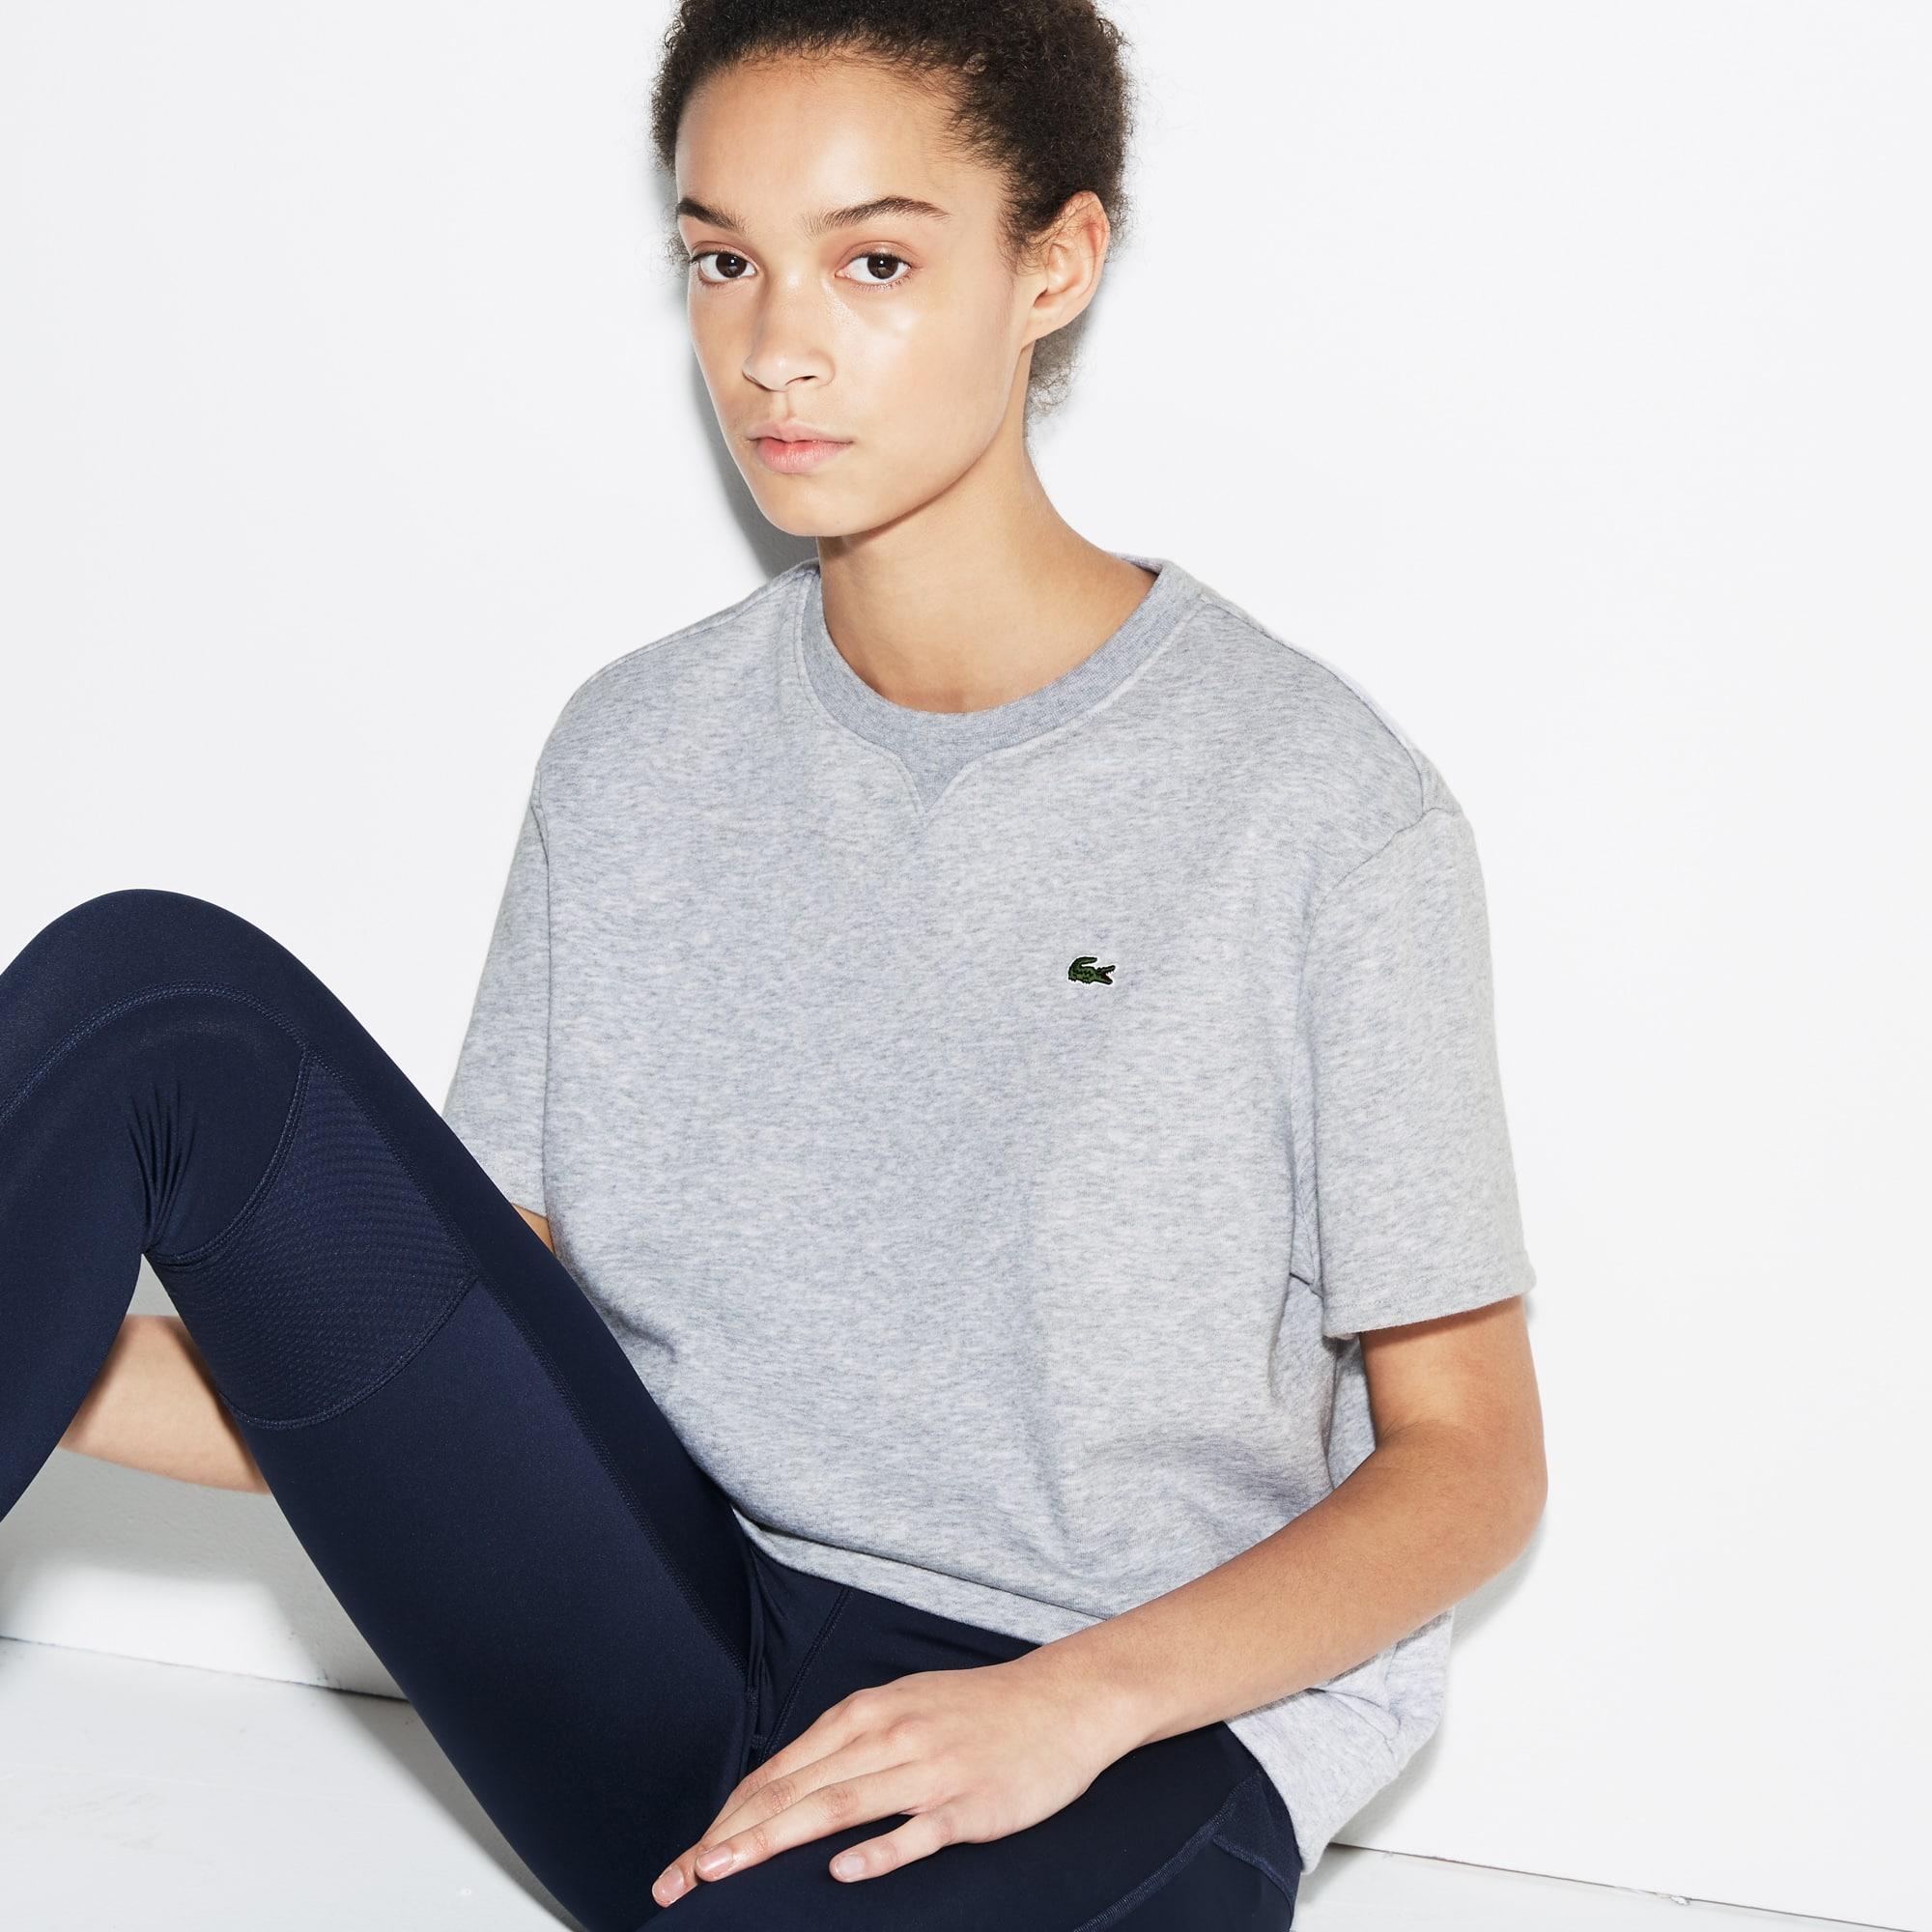 Damen LACOSTE SPORT Fleece Tennis-Sweatshirt